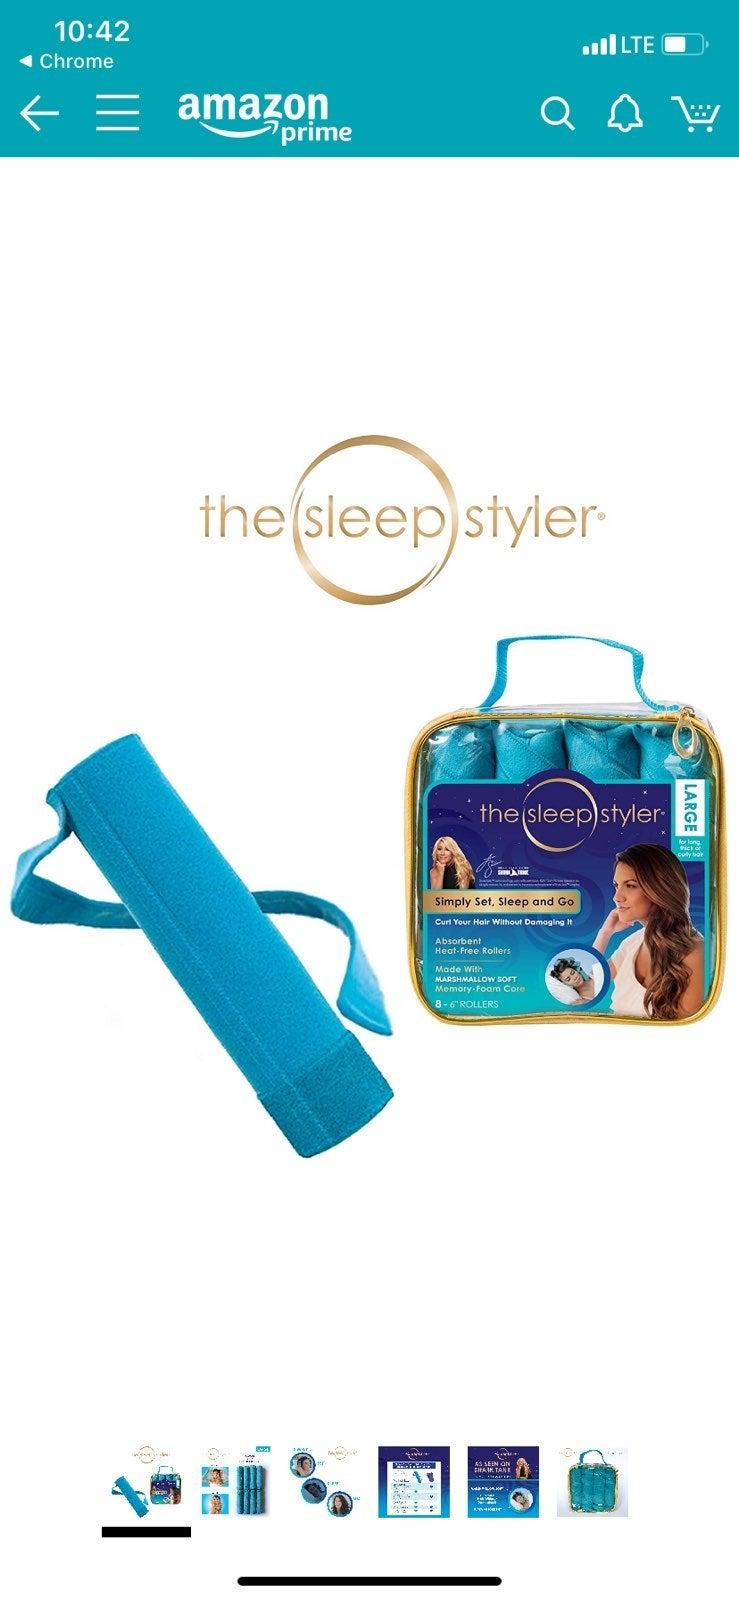 Sleepstyler curlers